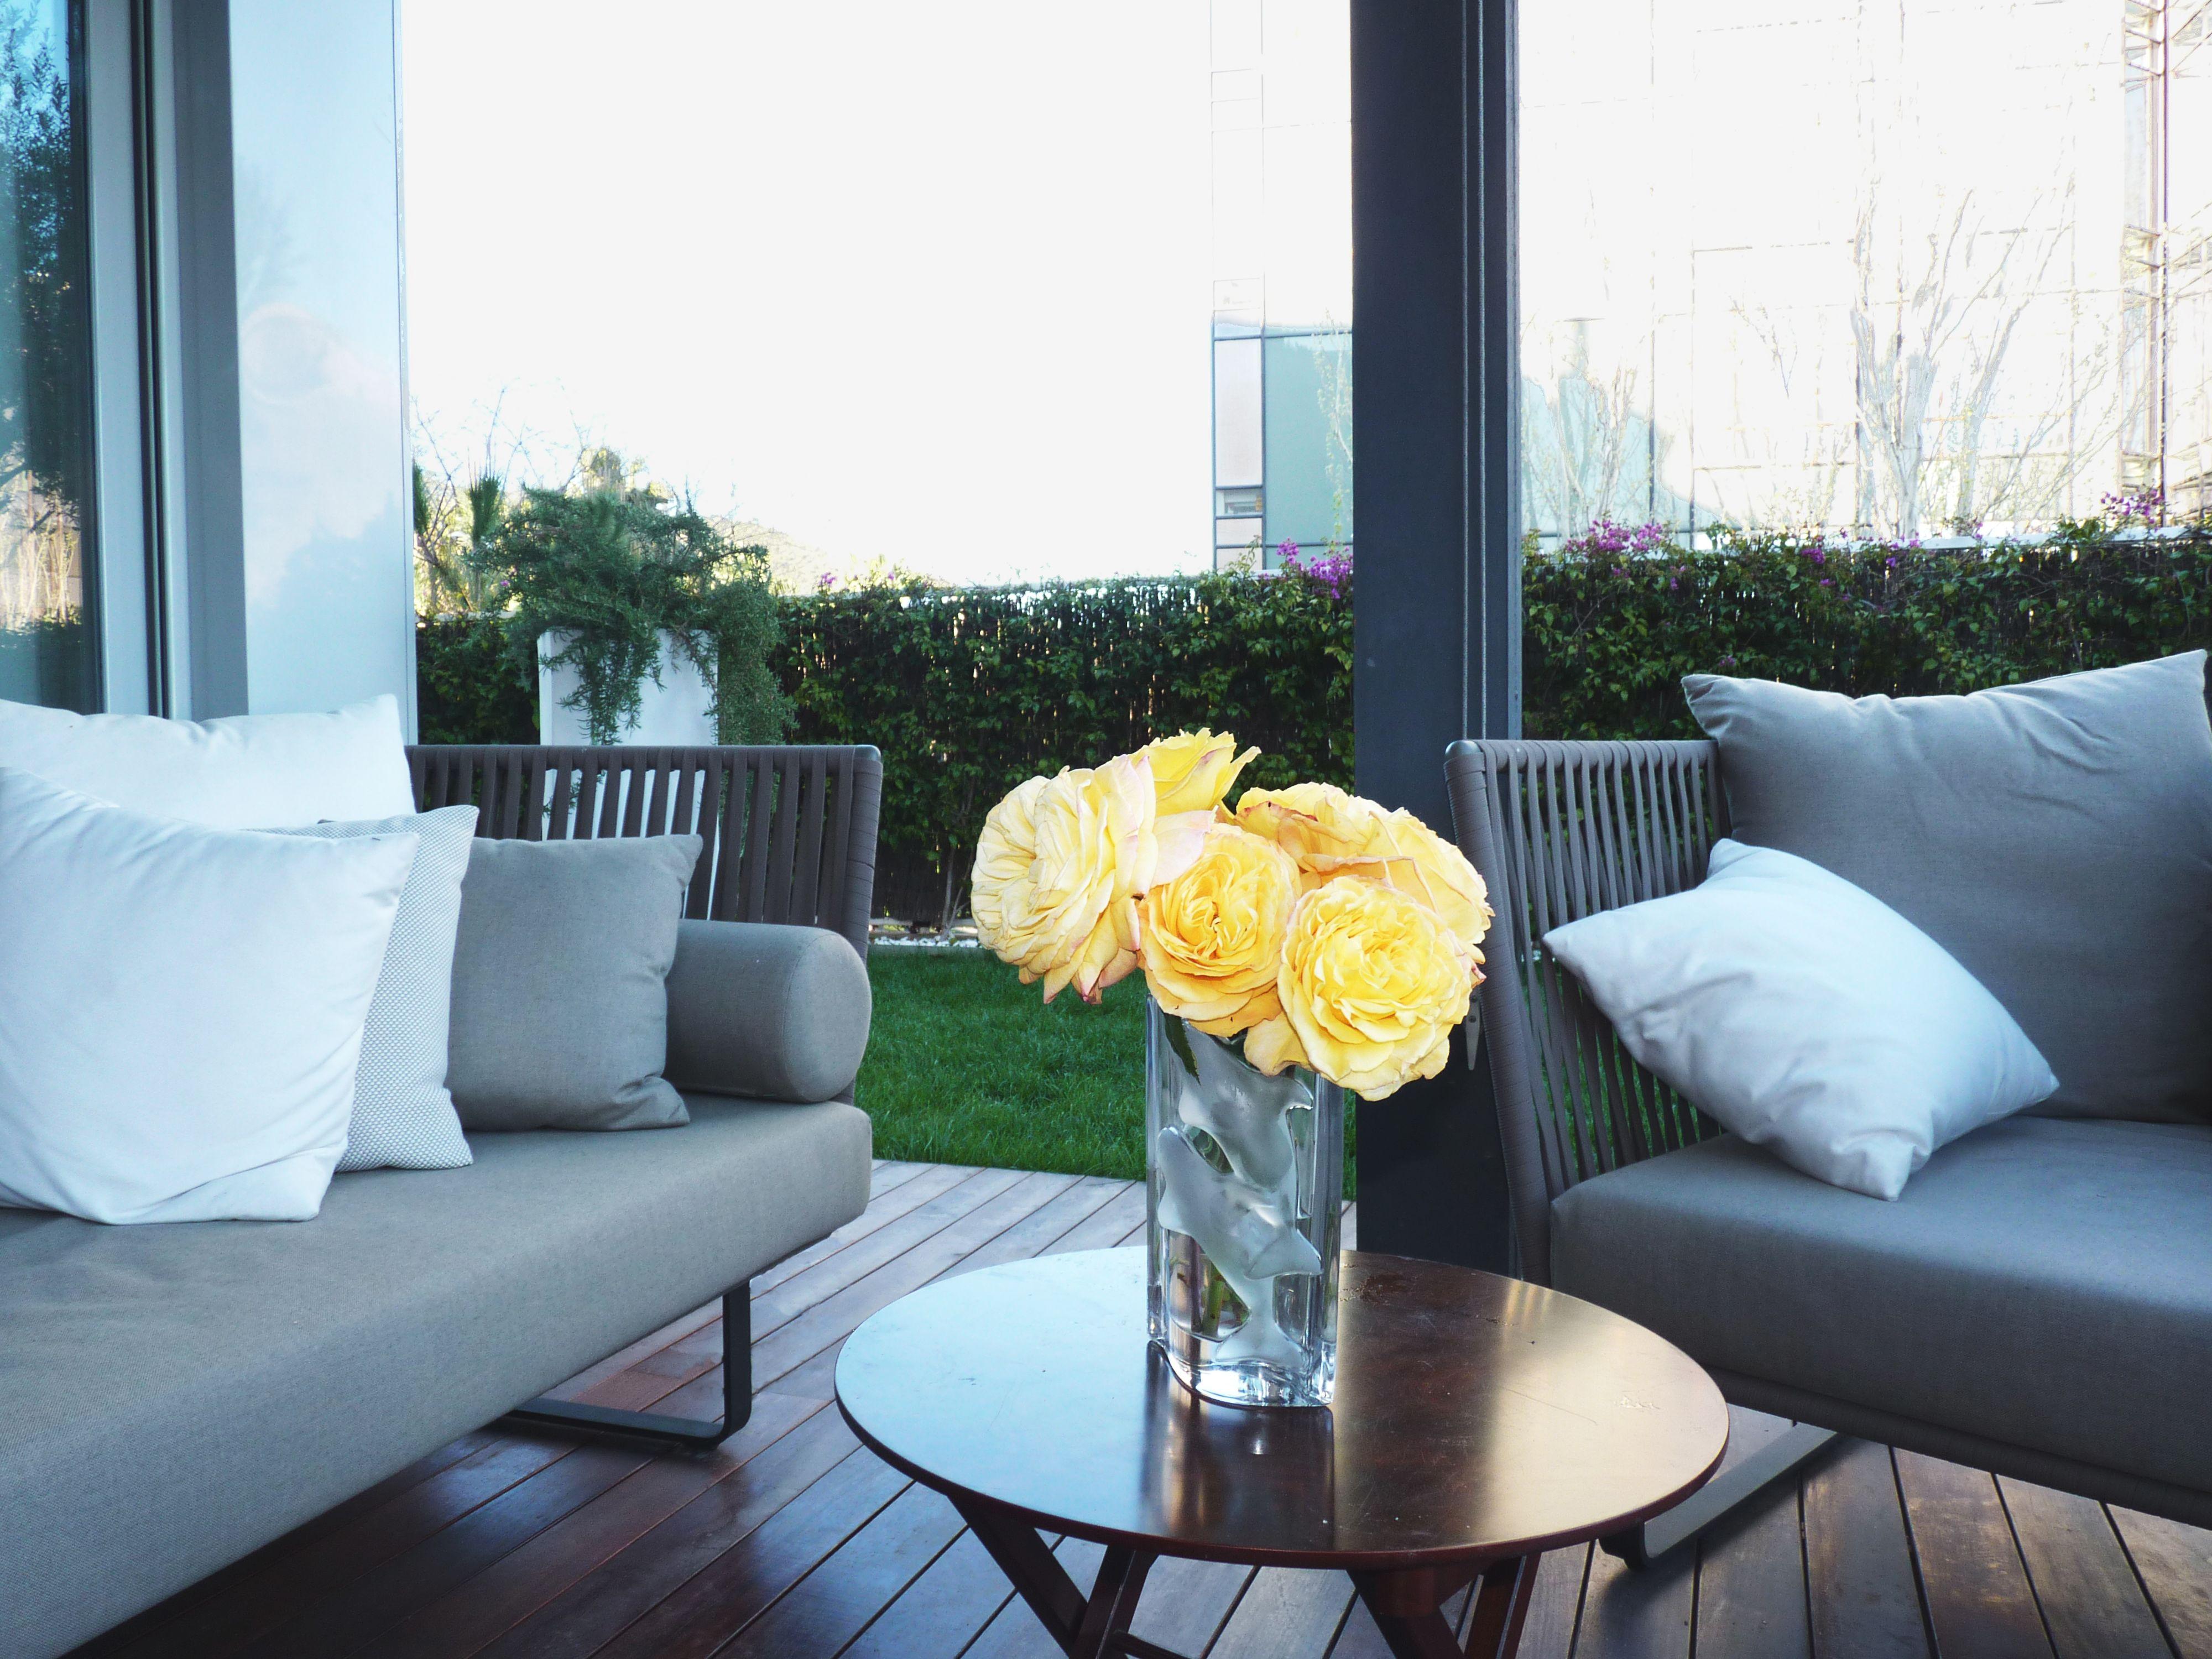 Ideas de paisajismo de exterior jardin terraza estilo for Decoracion exterior jardin contemporaneo